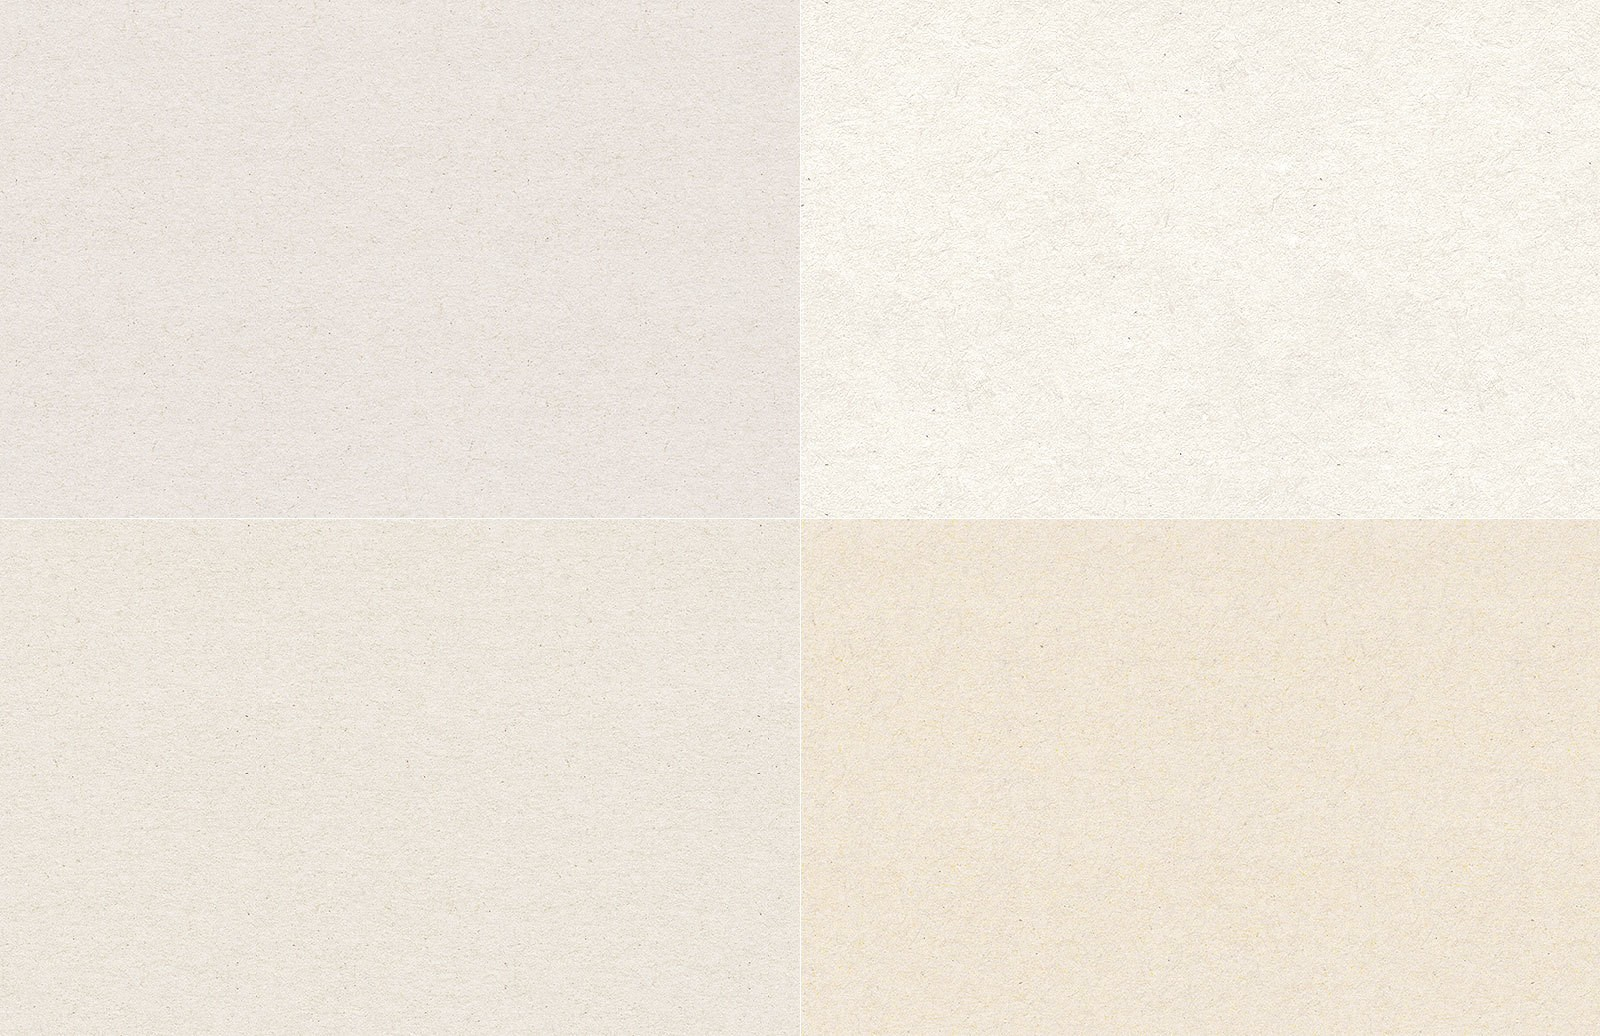 Seamless Rice Paper Textures